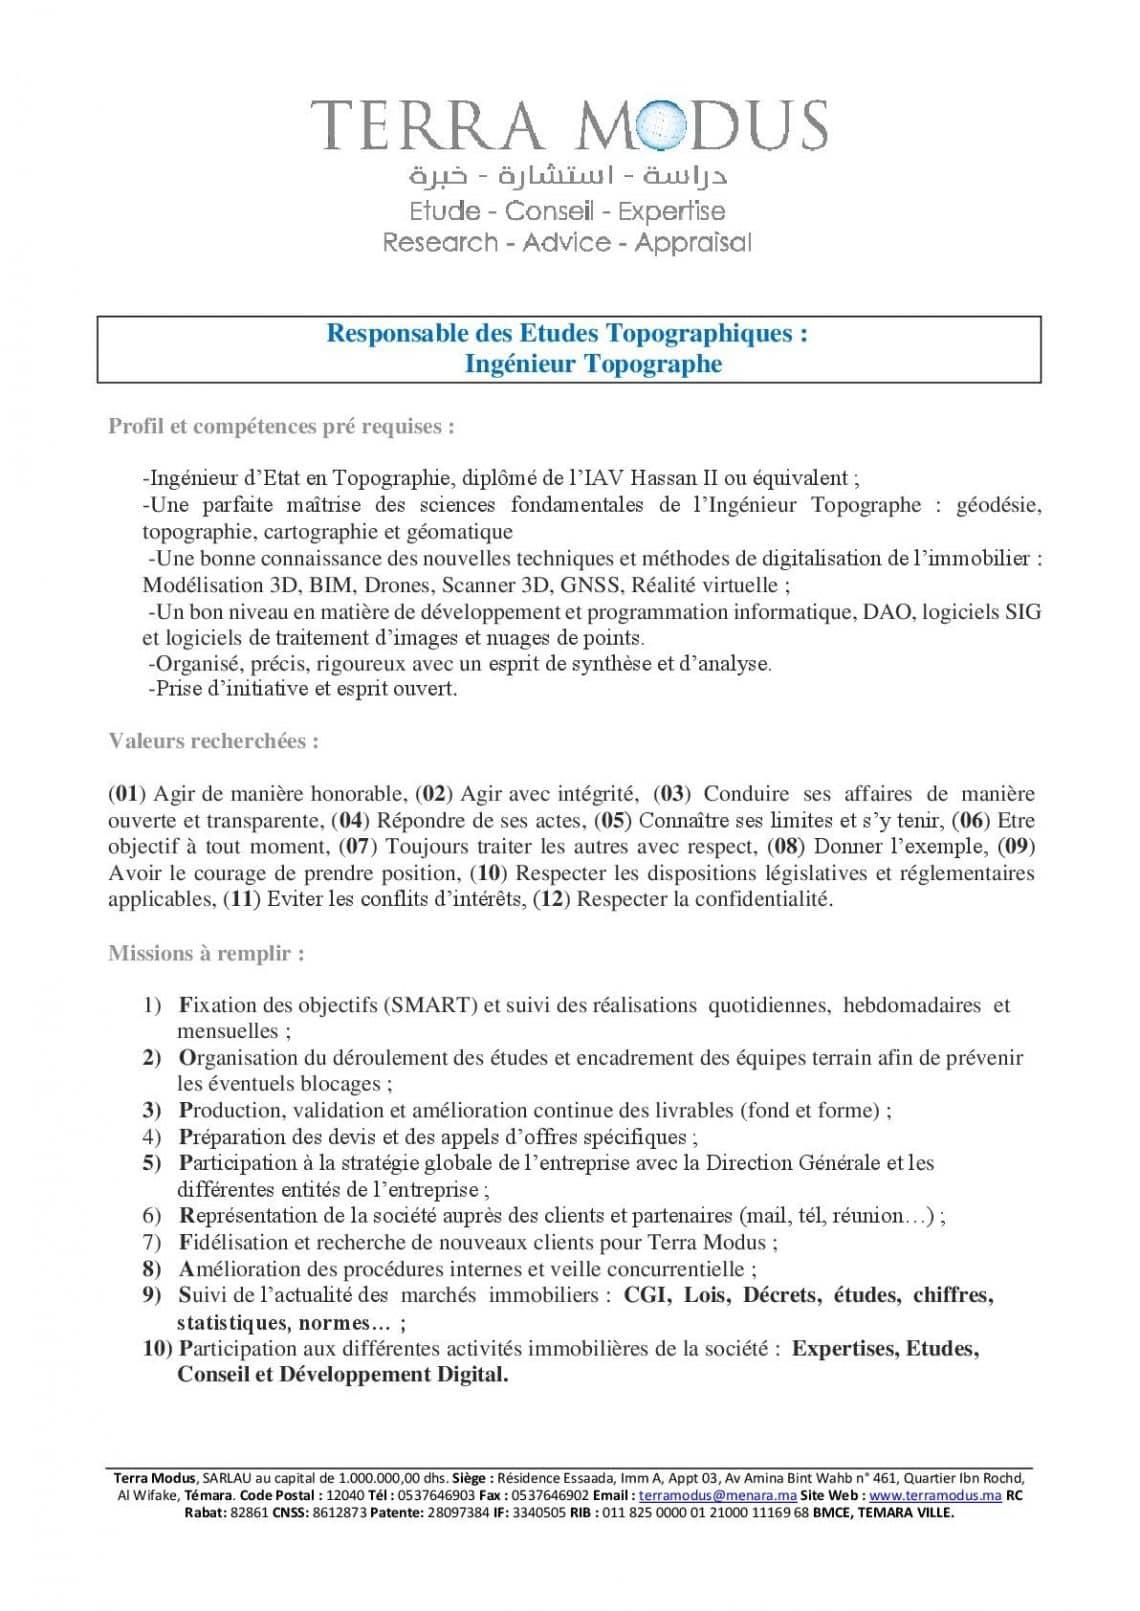 30 Offres d'Emploi (AXA - Suez - Hilton - Ventec - Locamed - Altran - UIR) - N°144